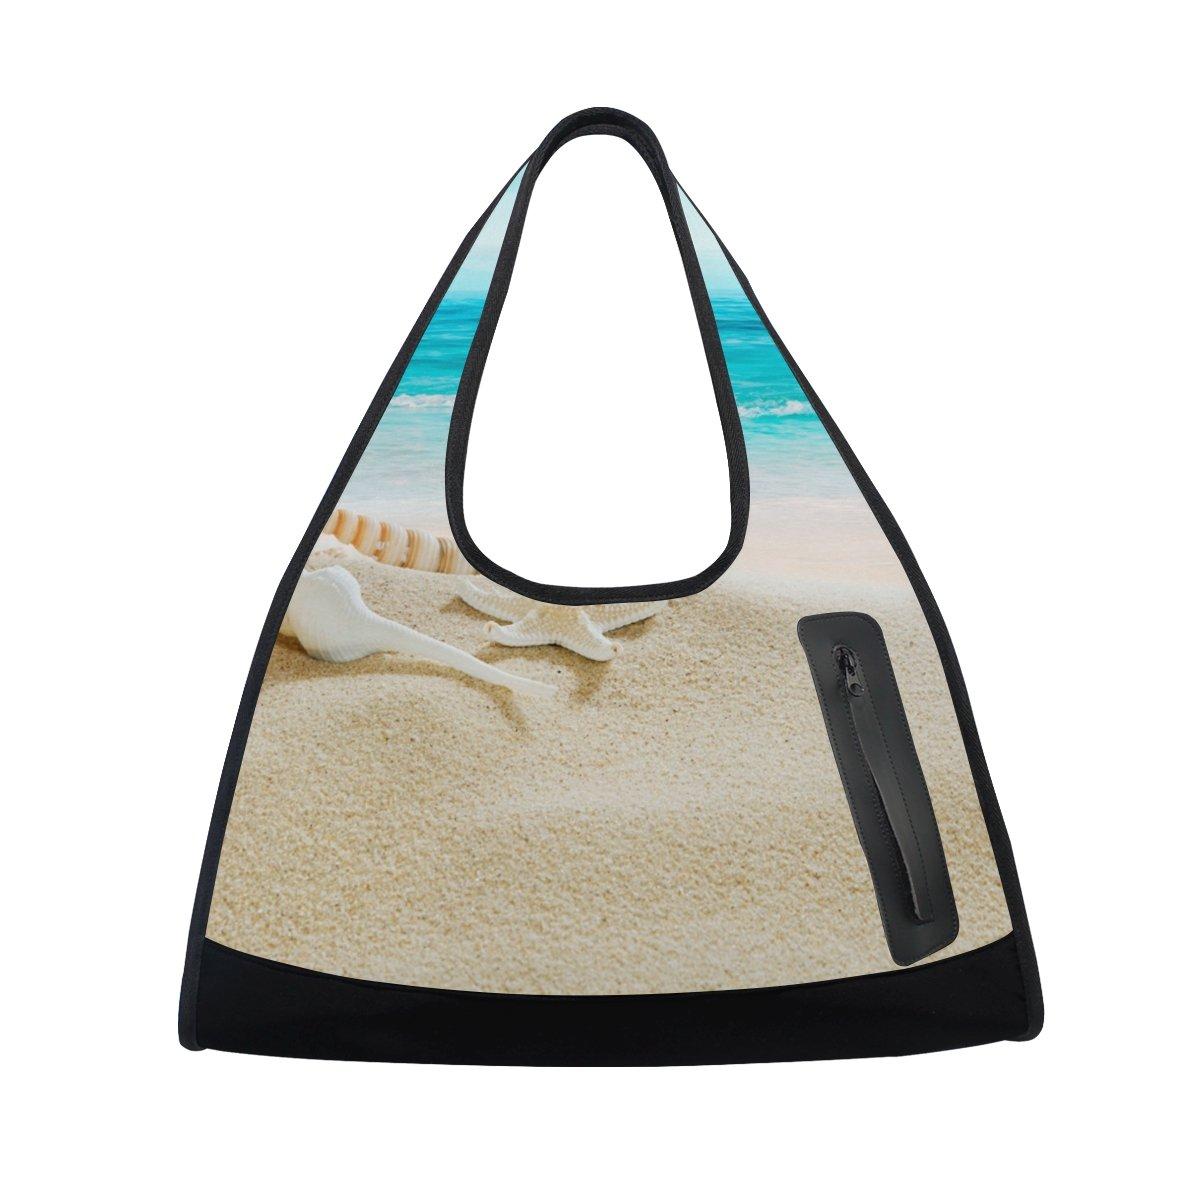 AHOMY Canvas Sports Gym Bag Seahells Beach Seawave Sunshine Travel Shoulder Bag